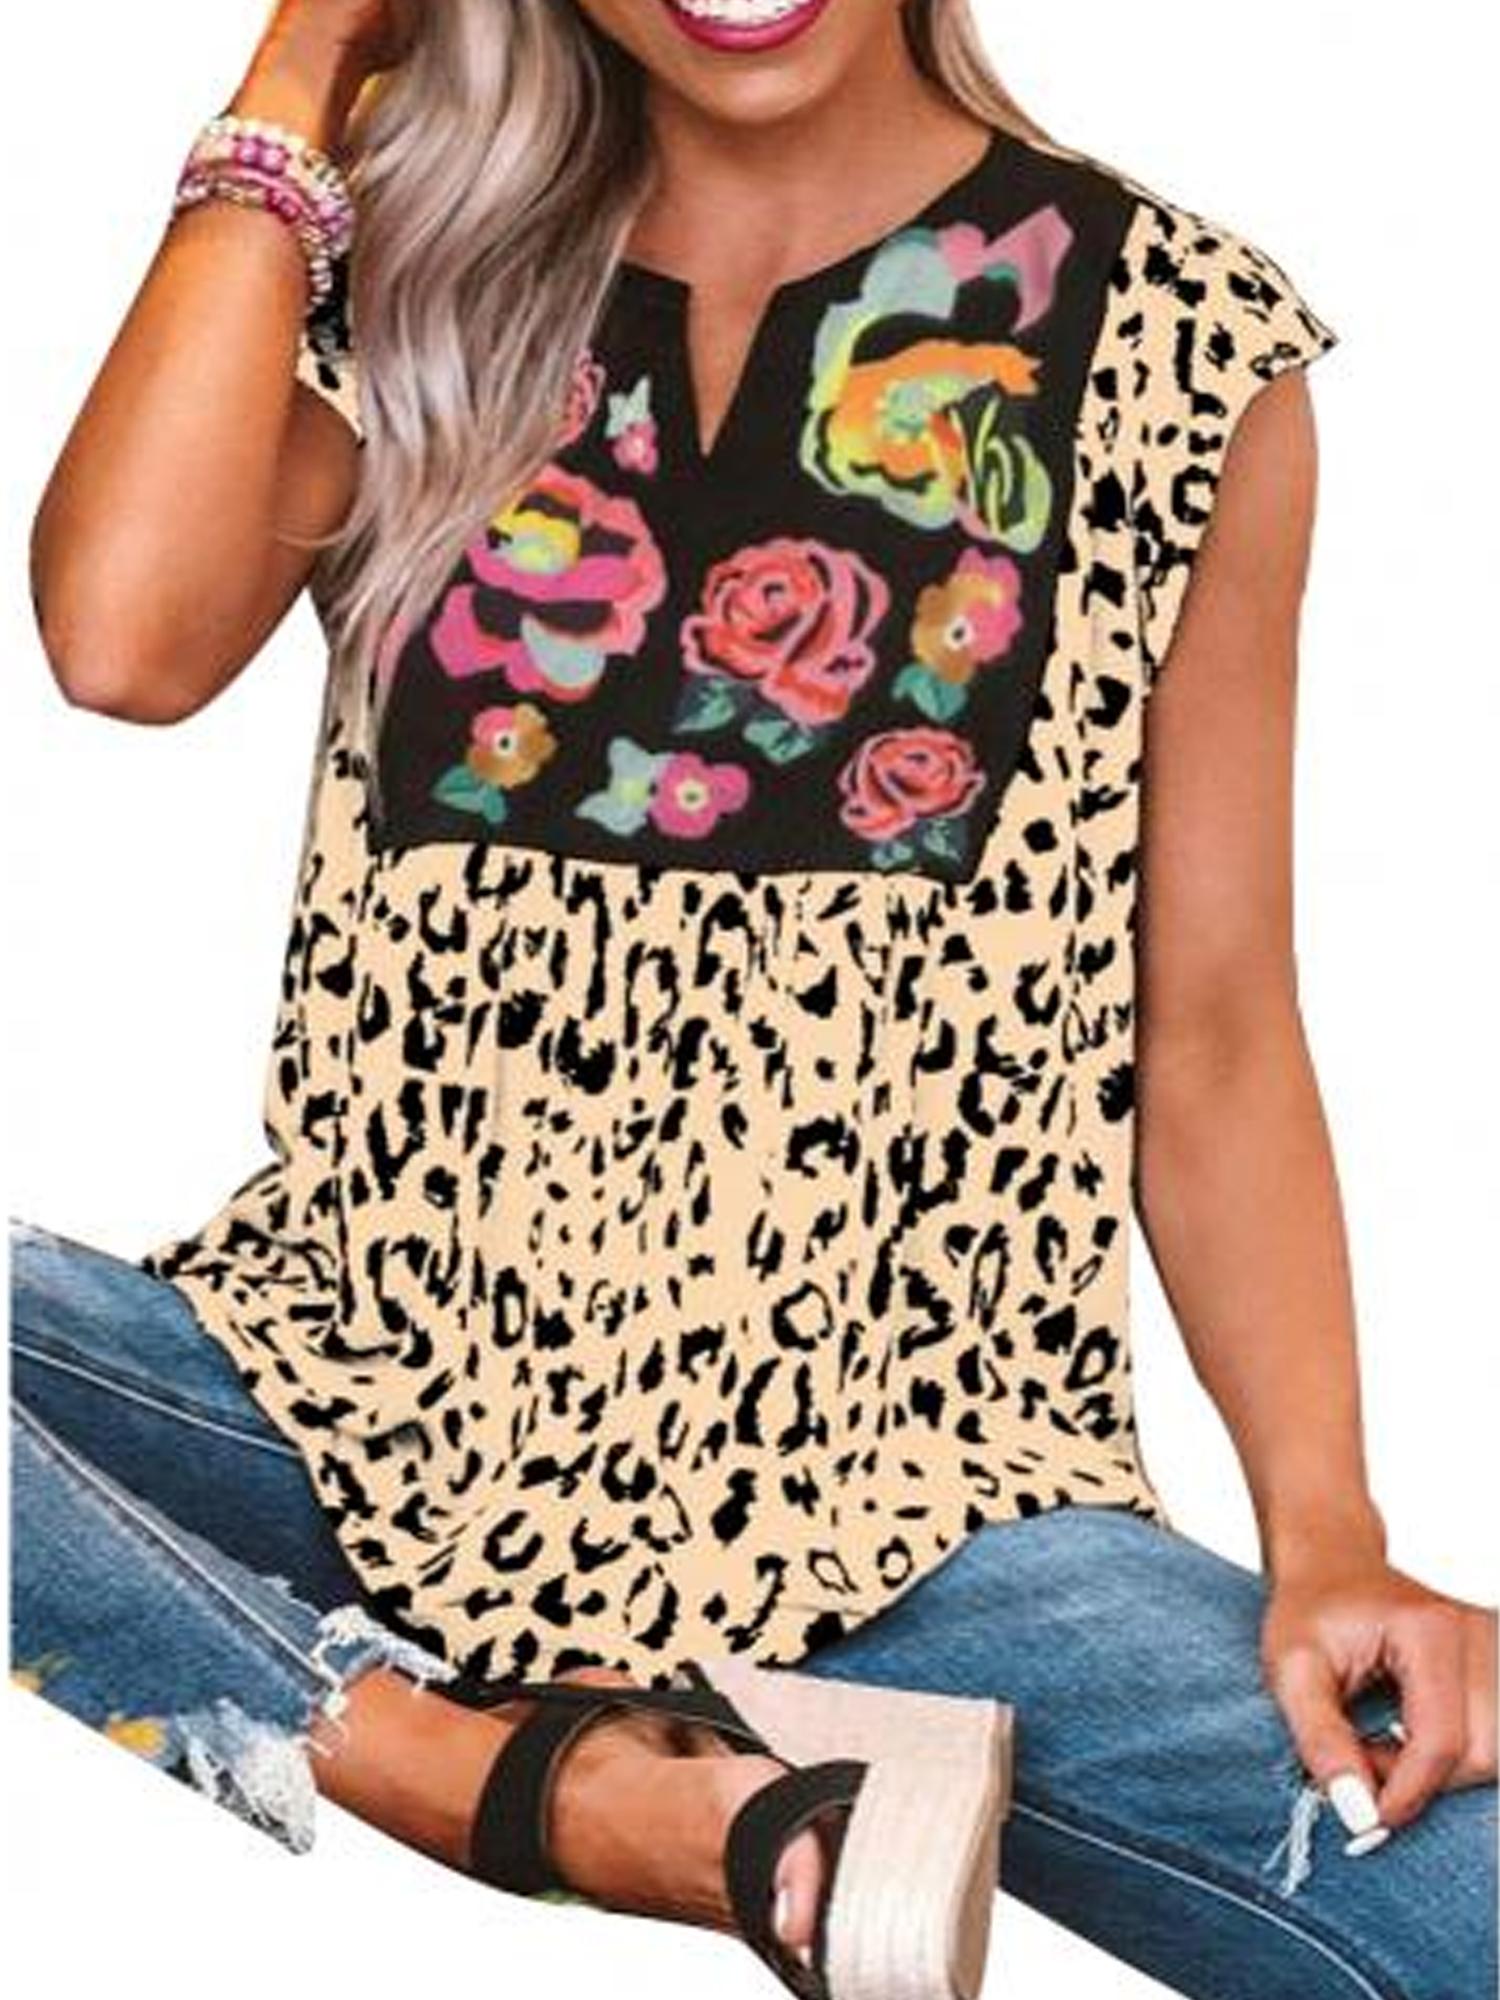 Boho Short Sleeve Floral Loose Tops Women Blouse T Shirt Tee V Neck Summer Beach